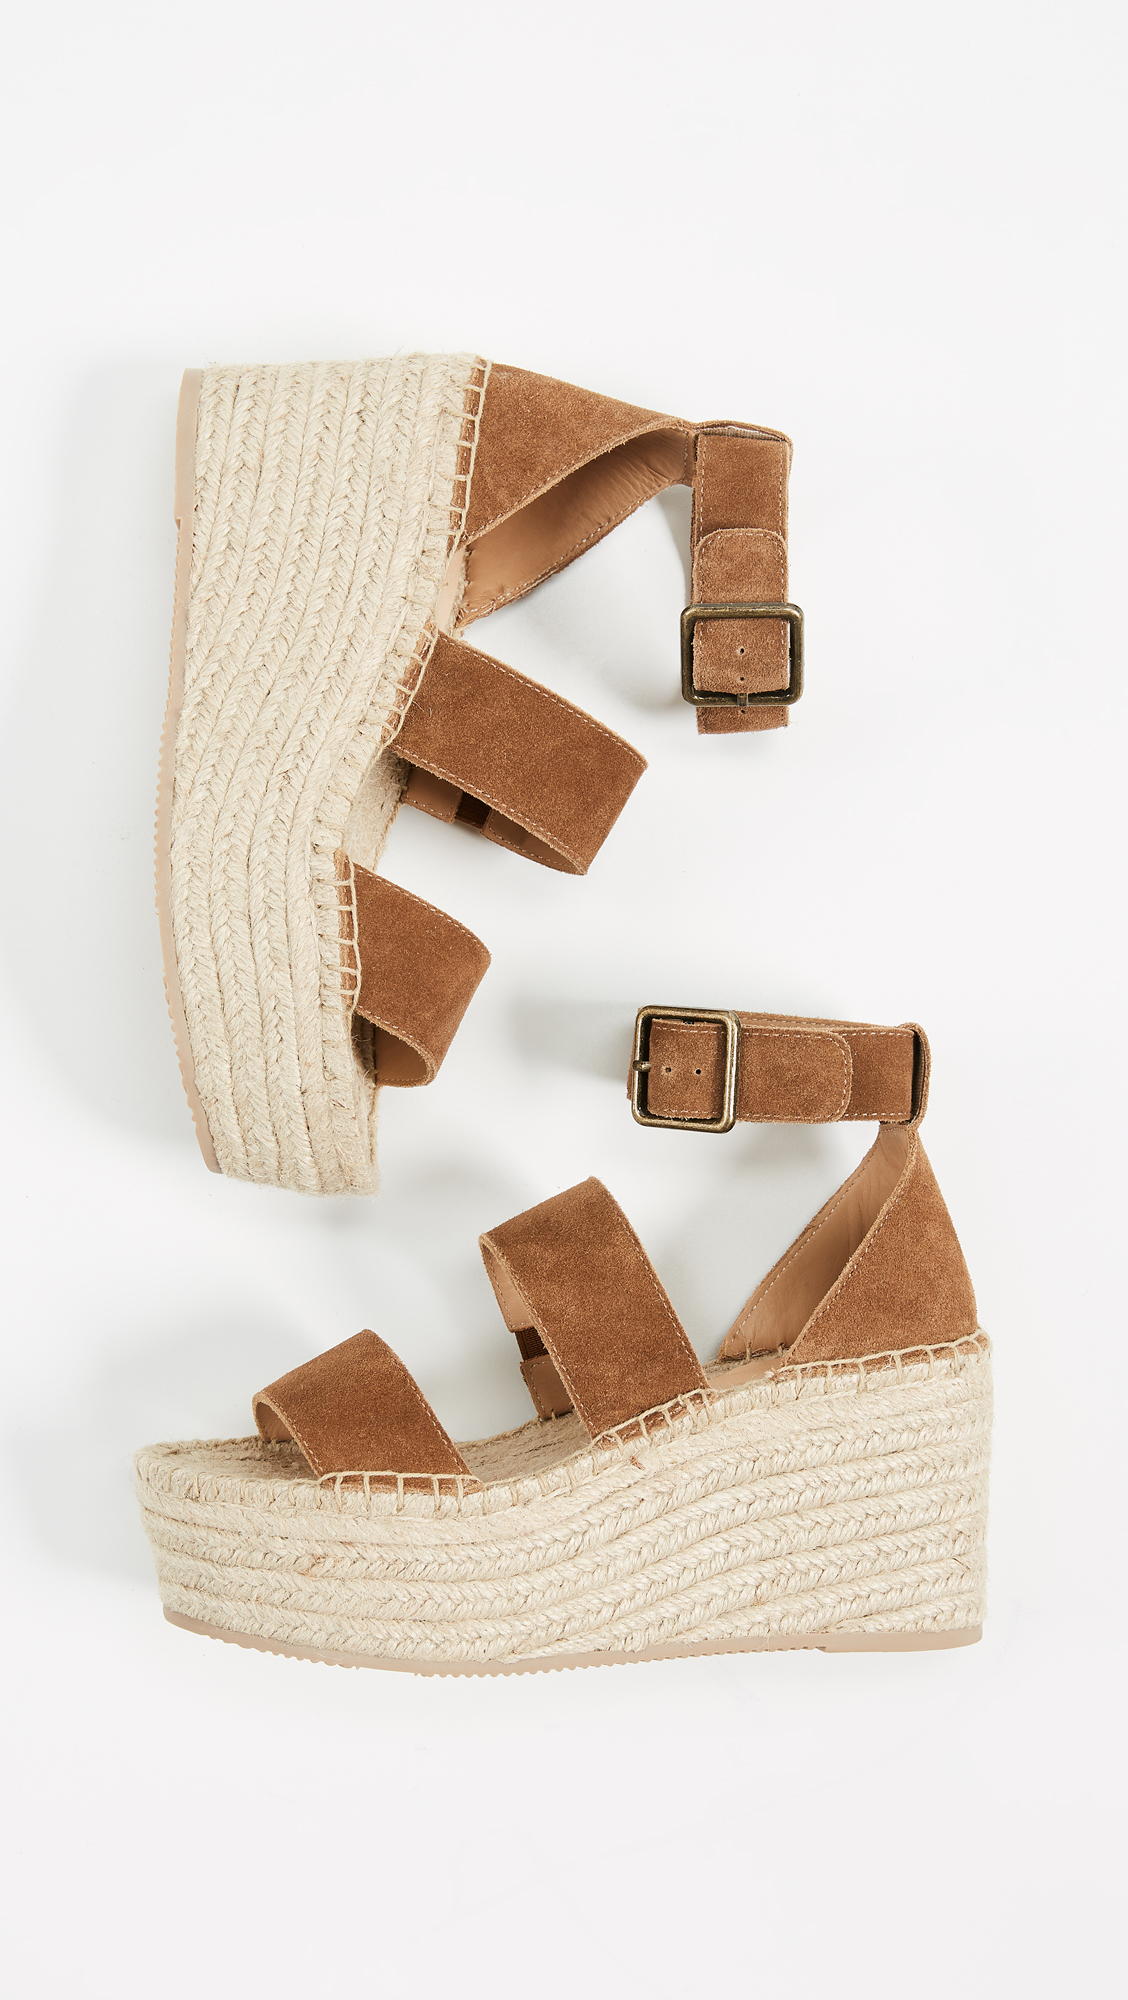 d2225605992 Soludos Palma Platform Sandals